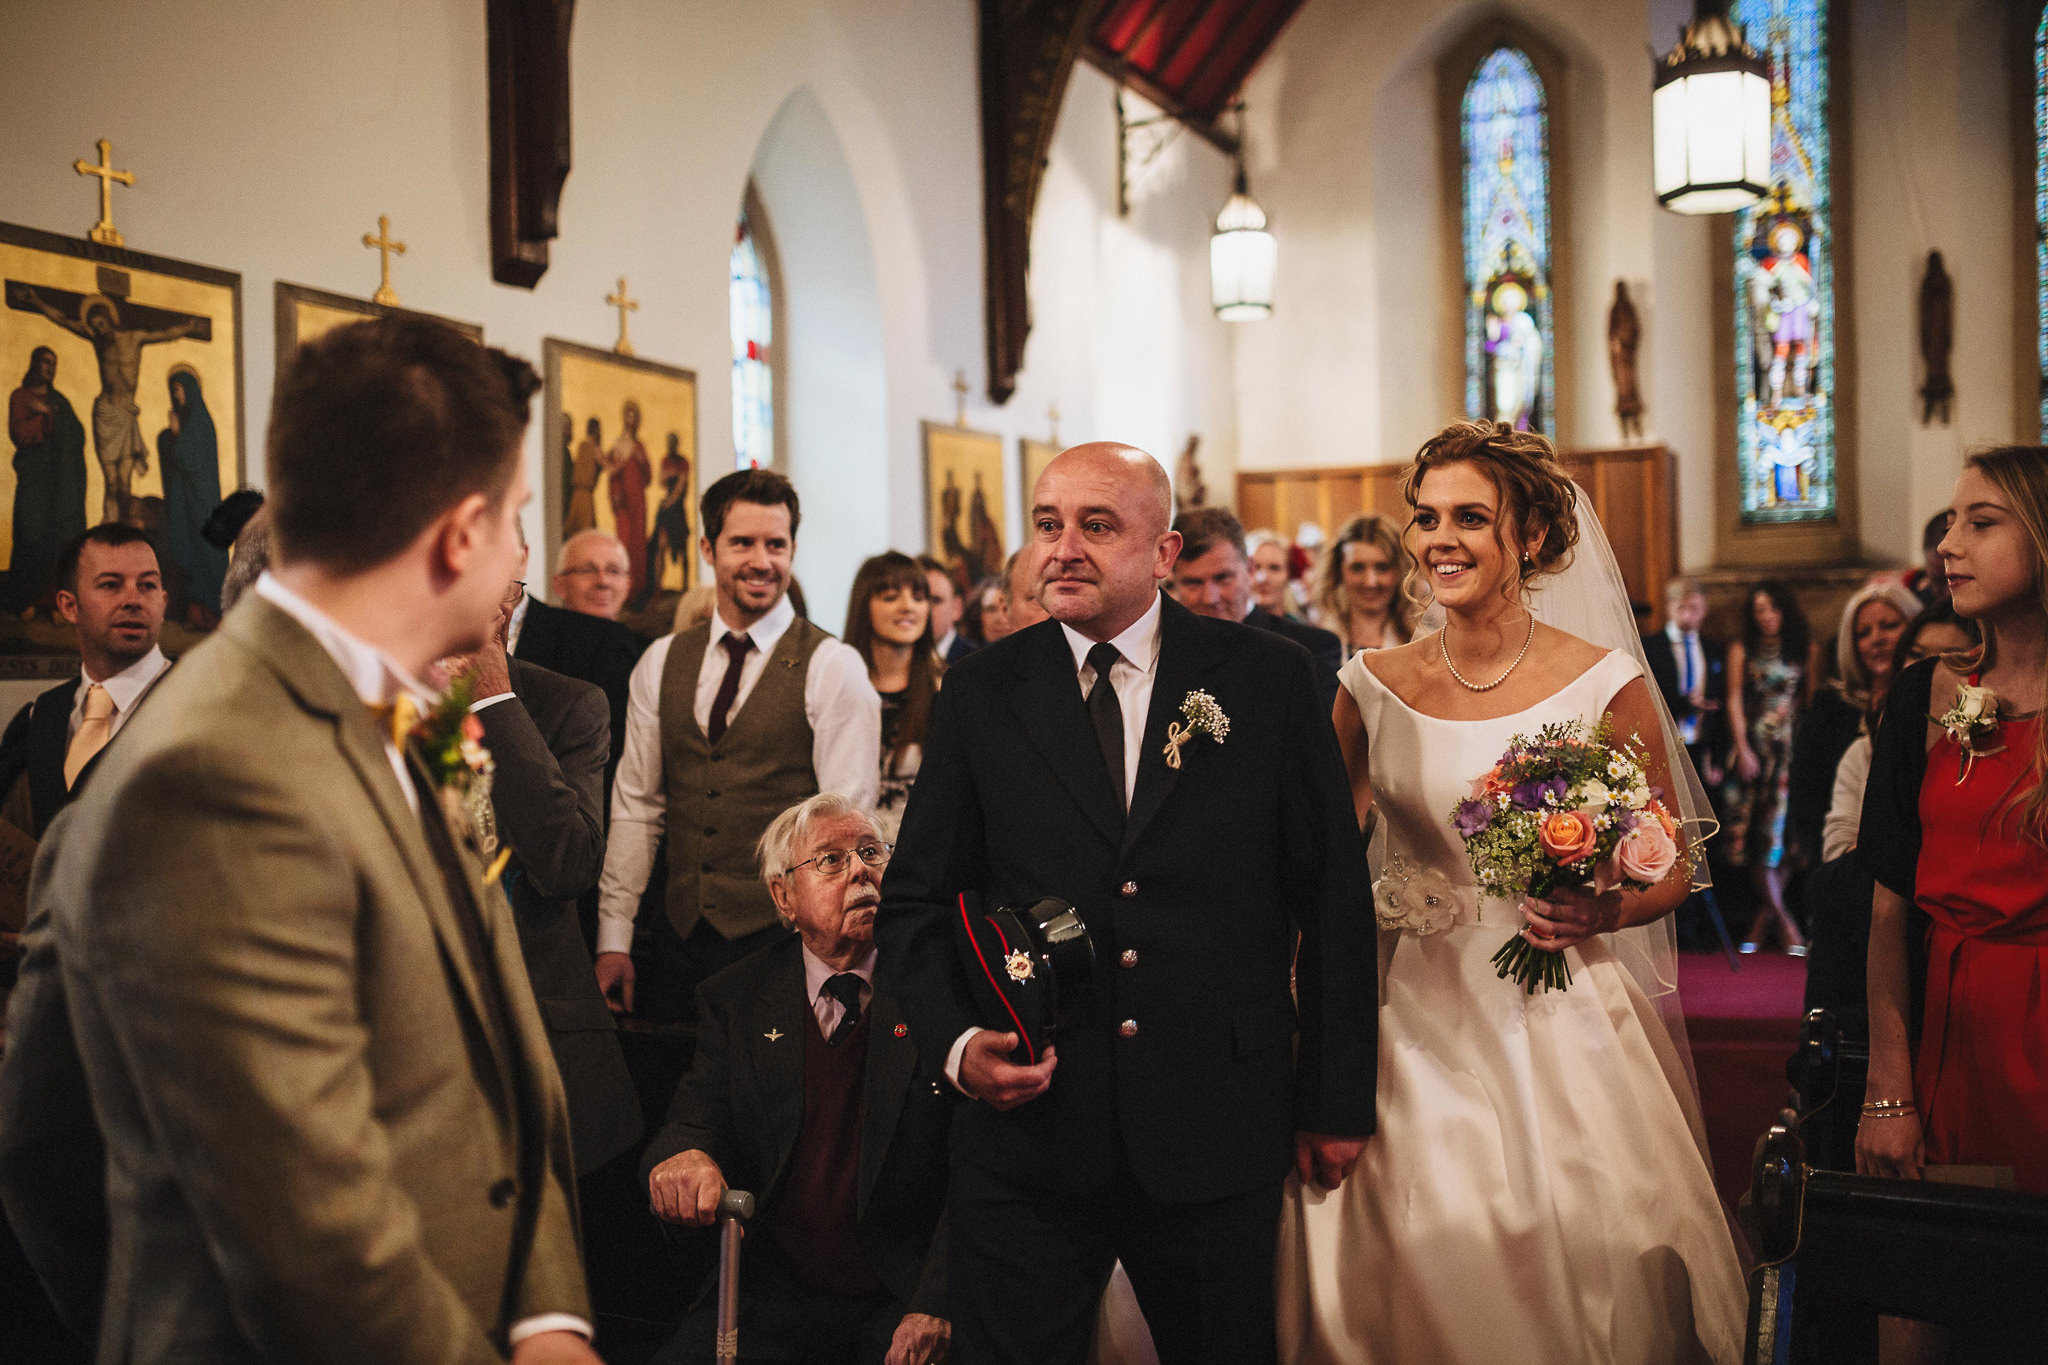 Lancashire-Creative-natural-documentary-wedding-photography-90028